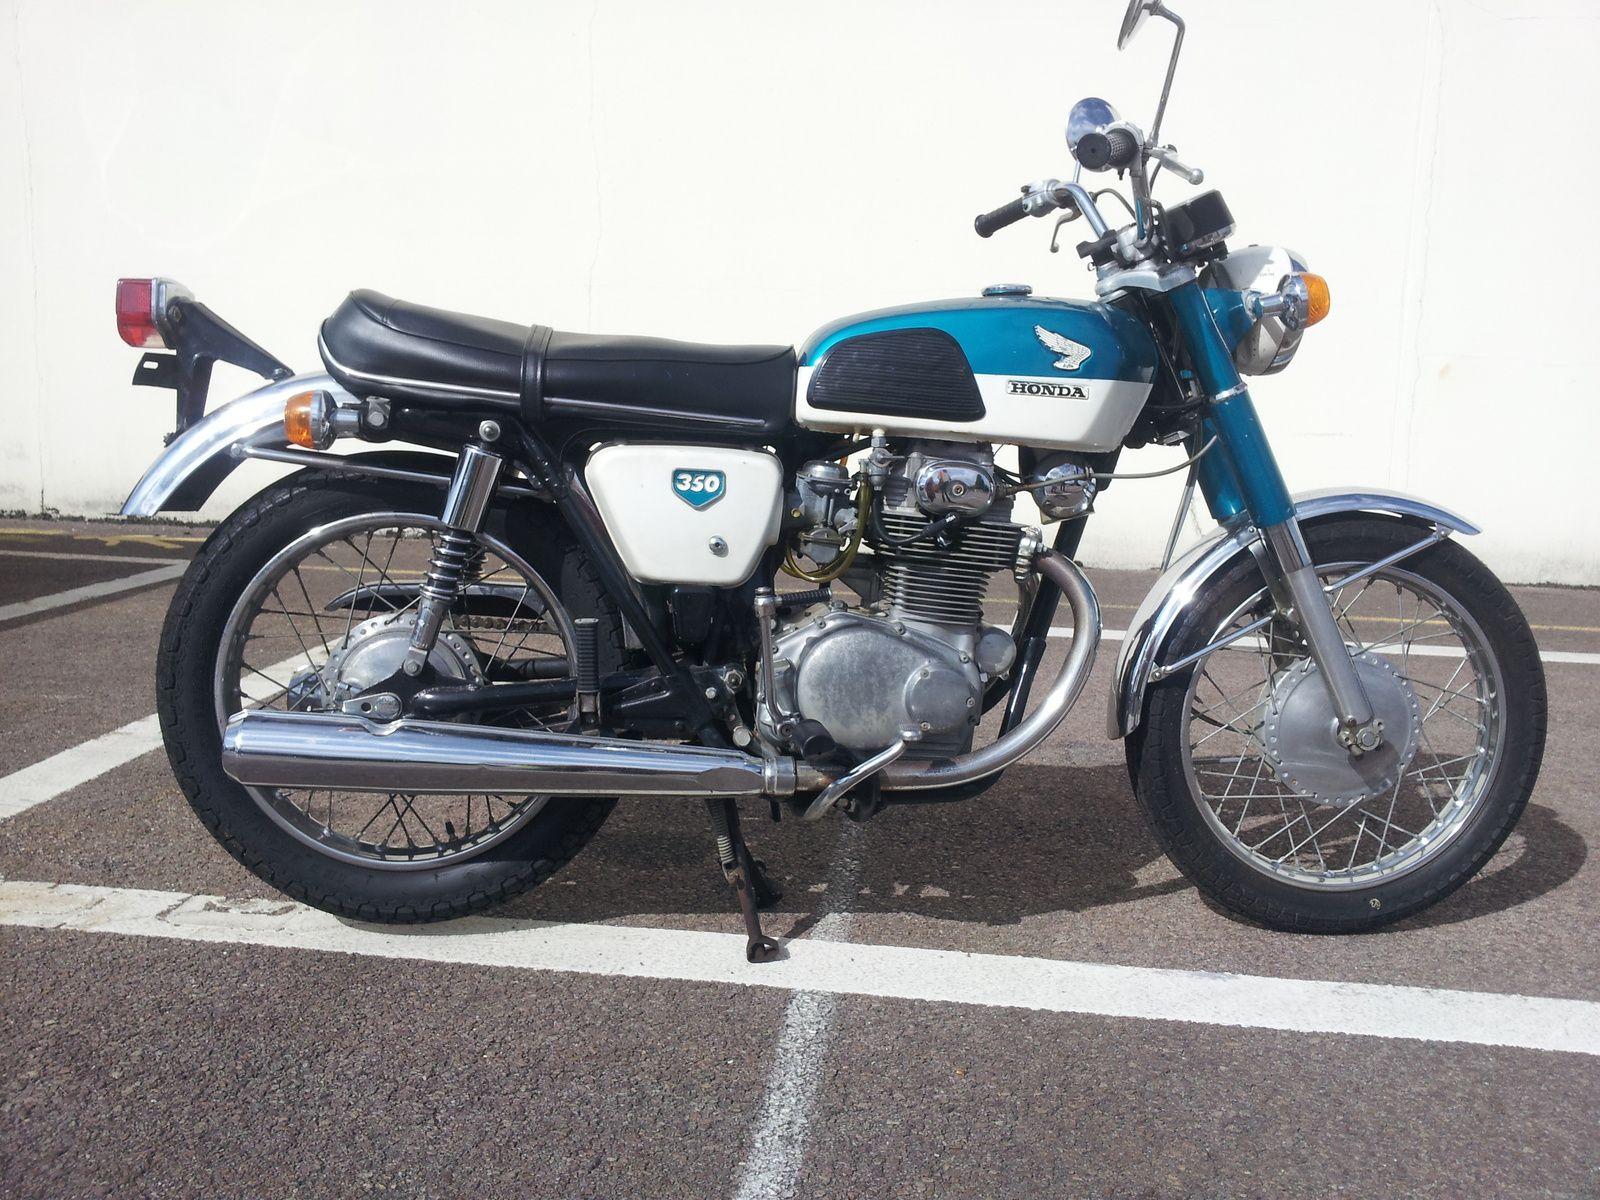 Mes motos depuis 1972 !